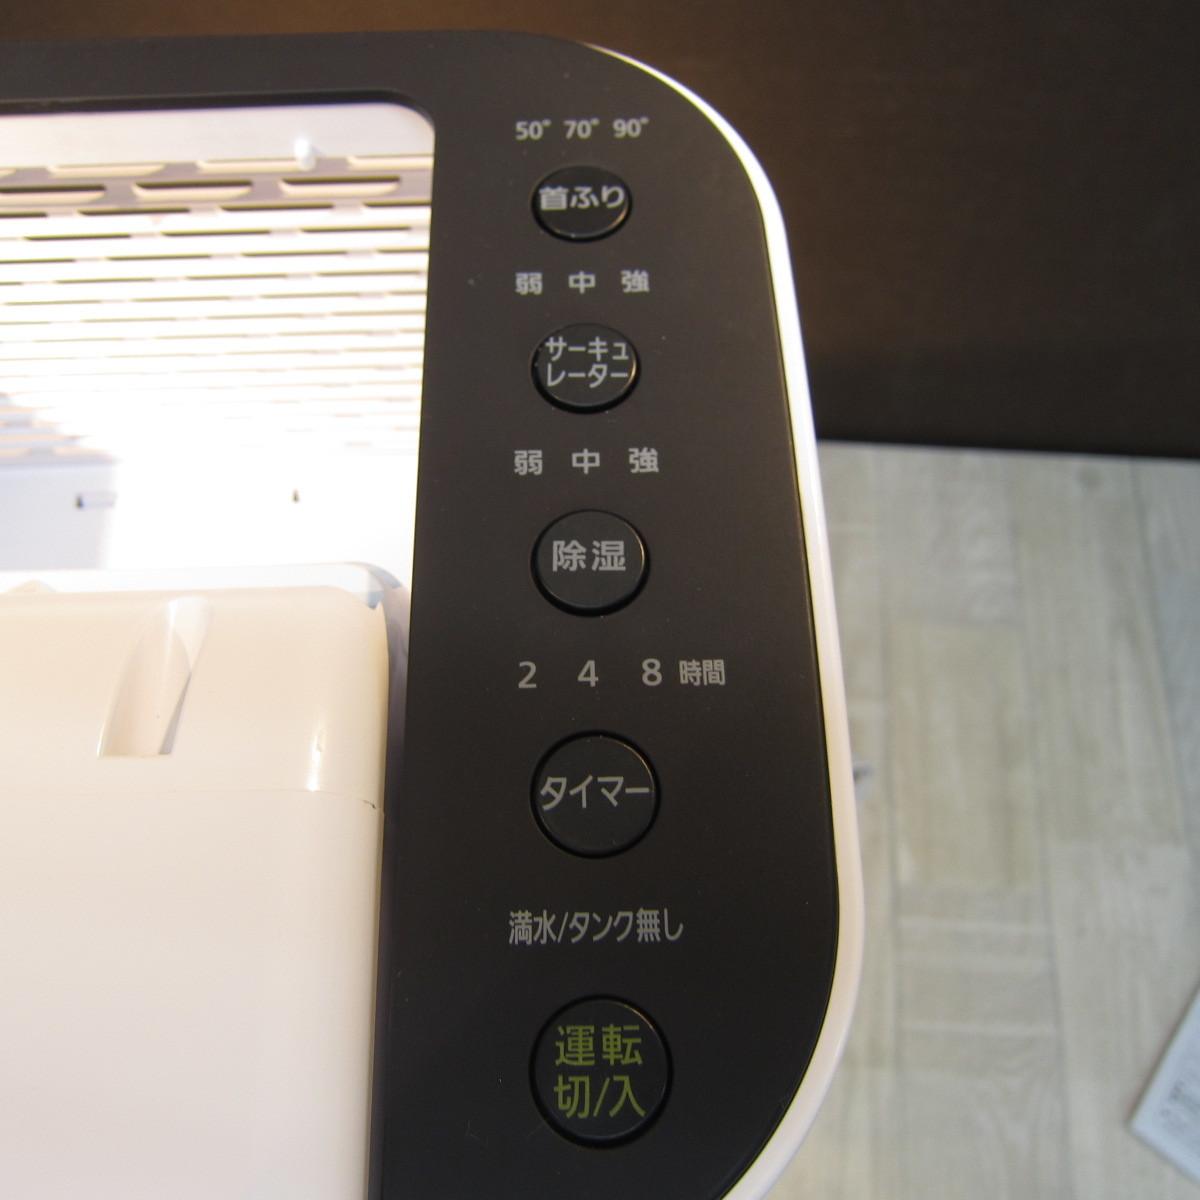 S6081【未使用】アイリスオーヤマ 衣類乾燥除湿機 スピード乾燥 サーキュレーター機能付 デシカント式 ホワイト IJD-I50_画像3